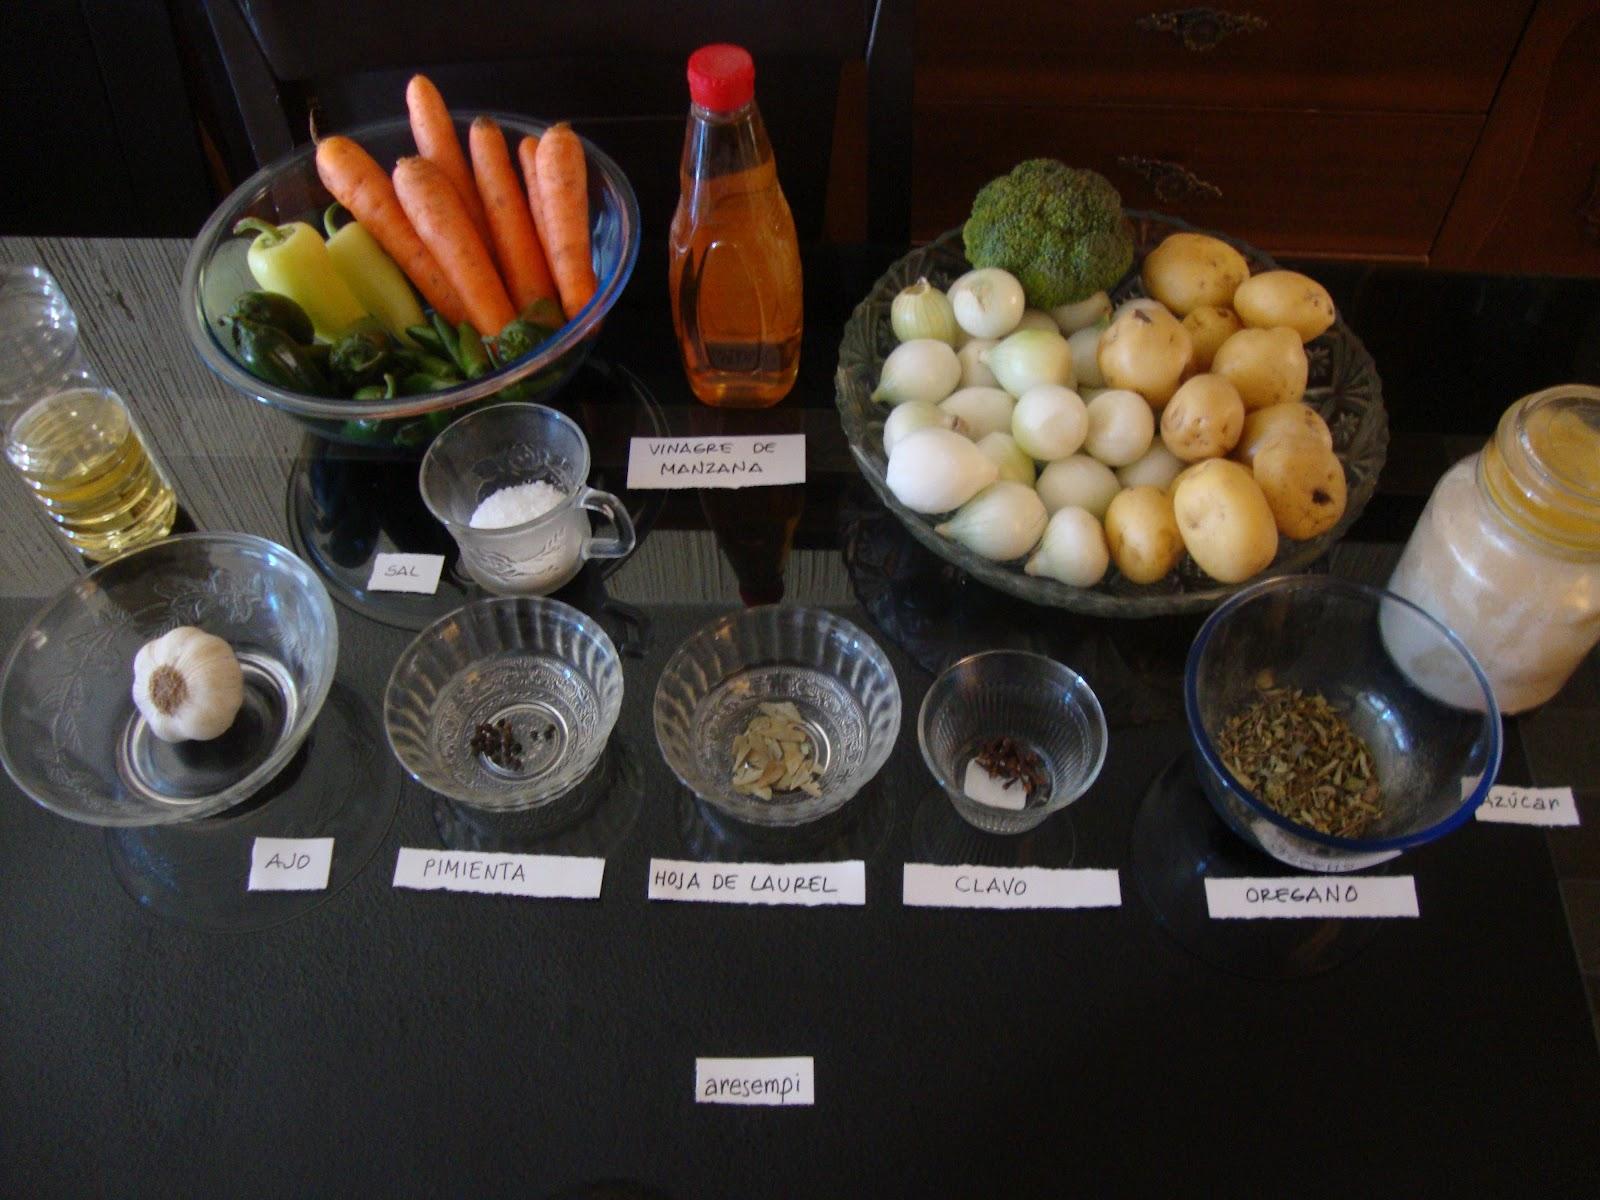 vinagre preparacion: